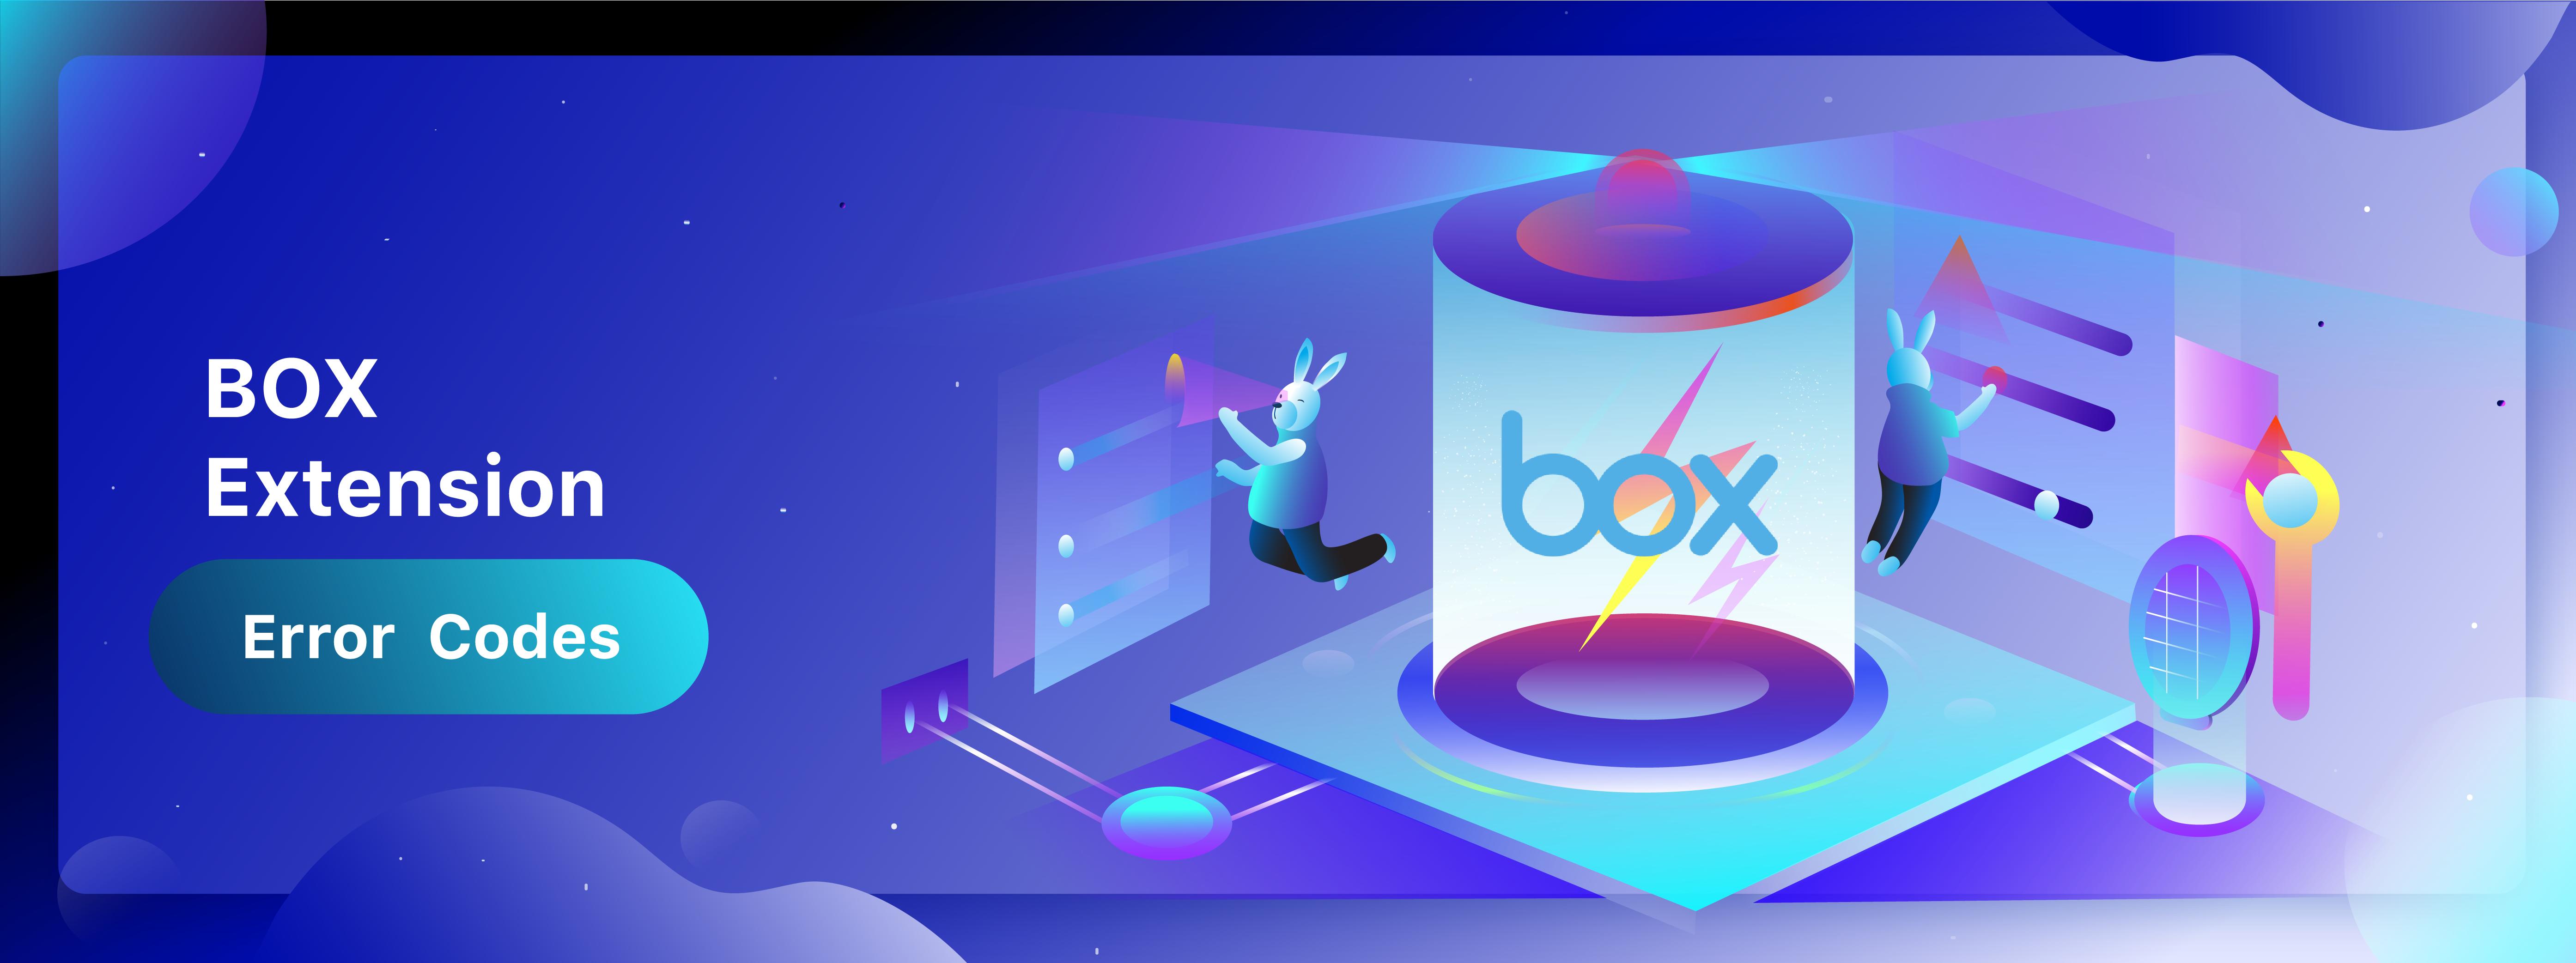 Box Extension Error Codes | HelpDeskHelpDesk